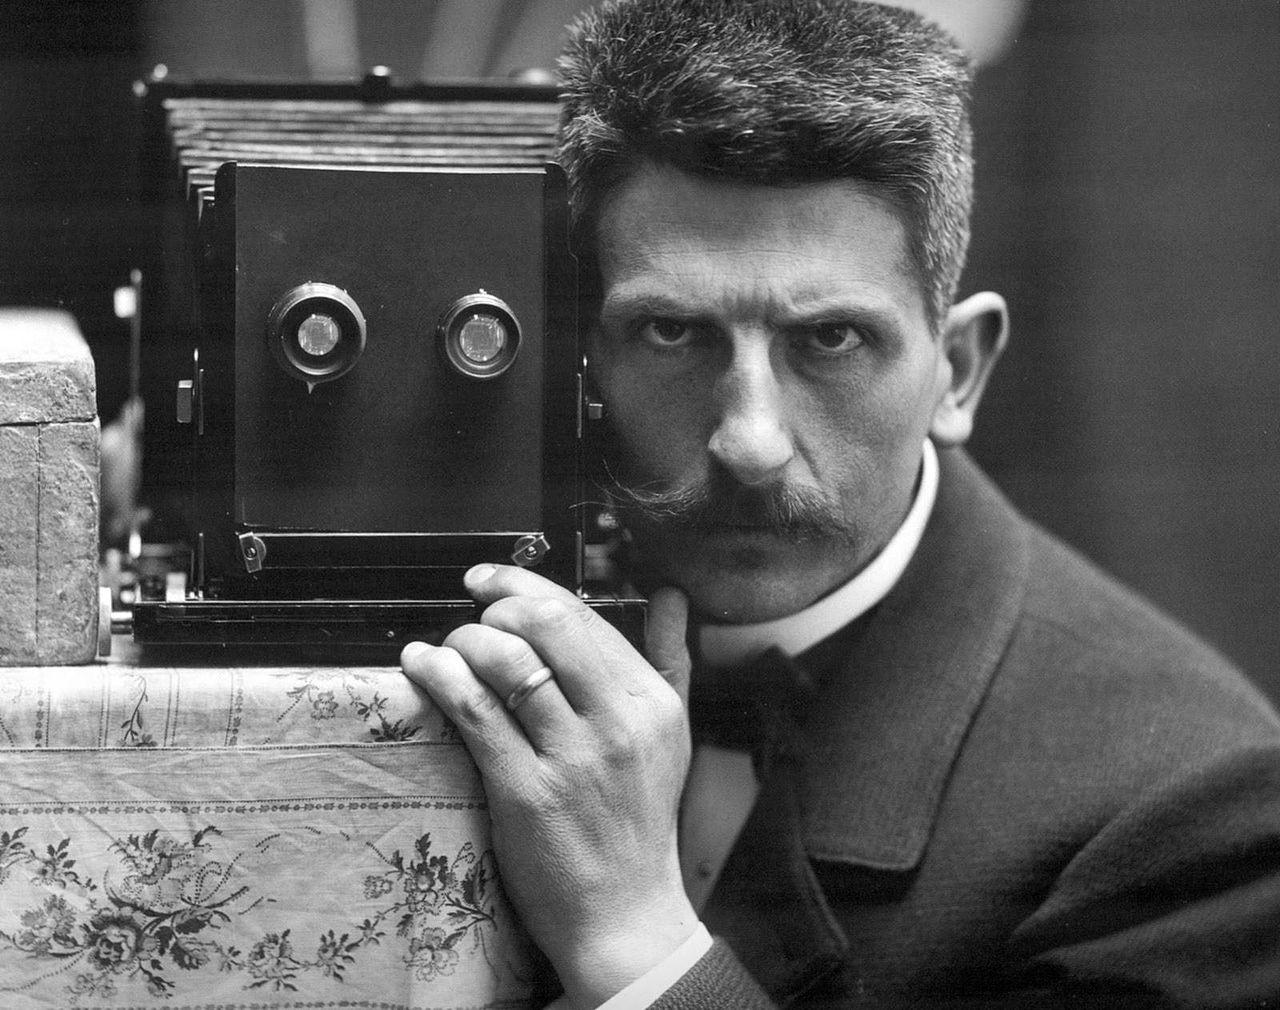 Self_picture_via_mirror_-_Frédéric_Boissonnas_-_1900